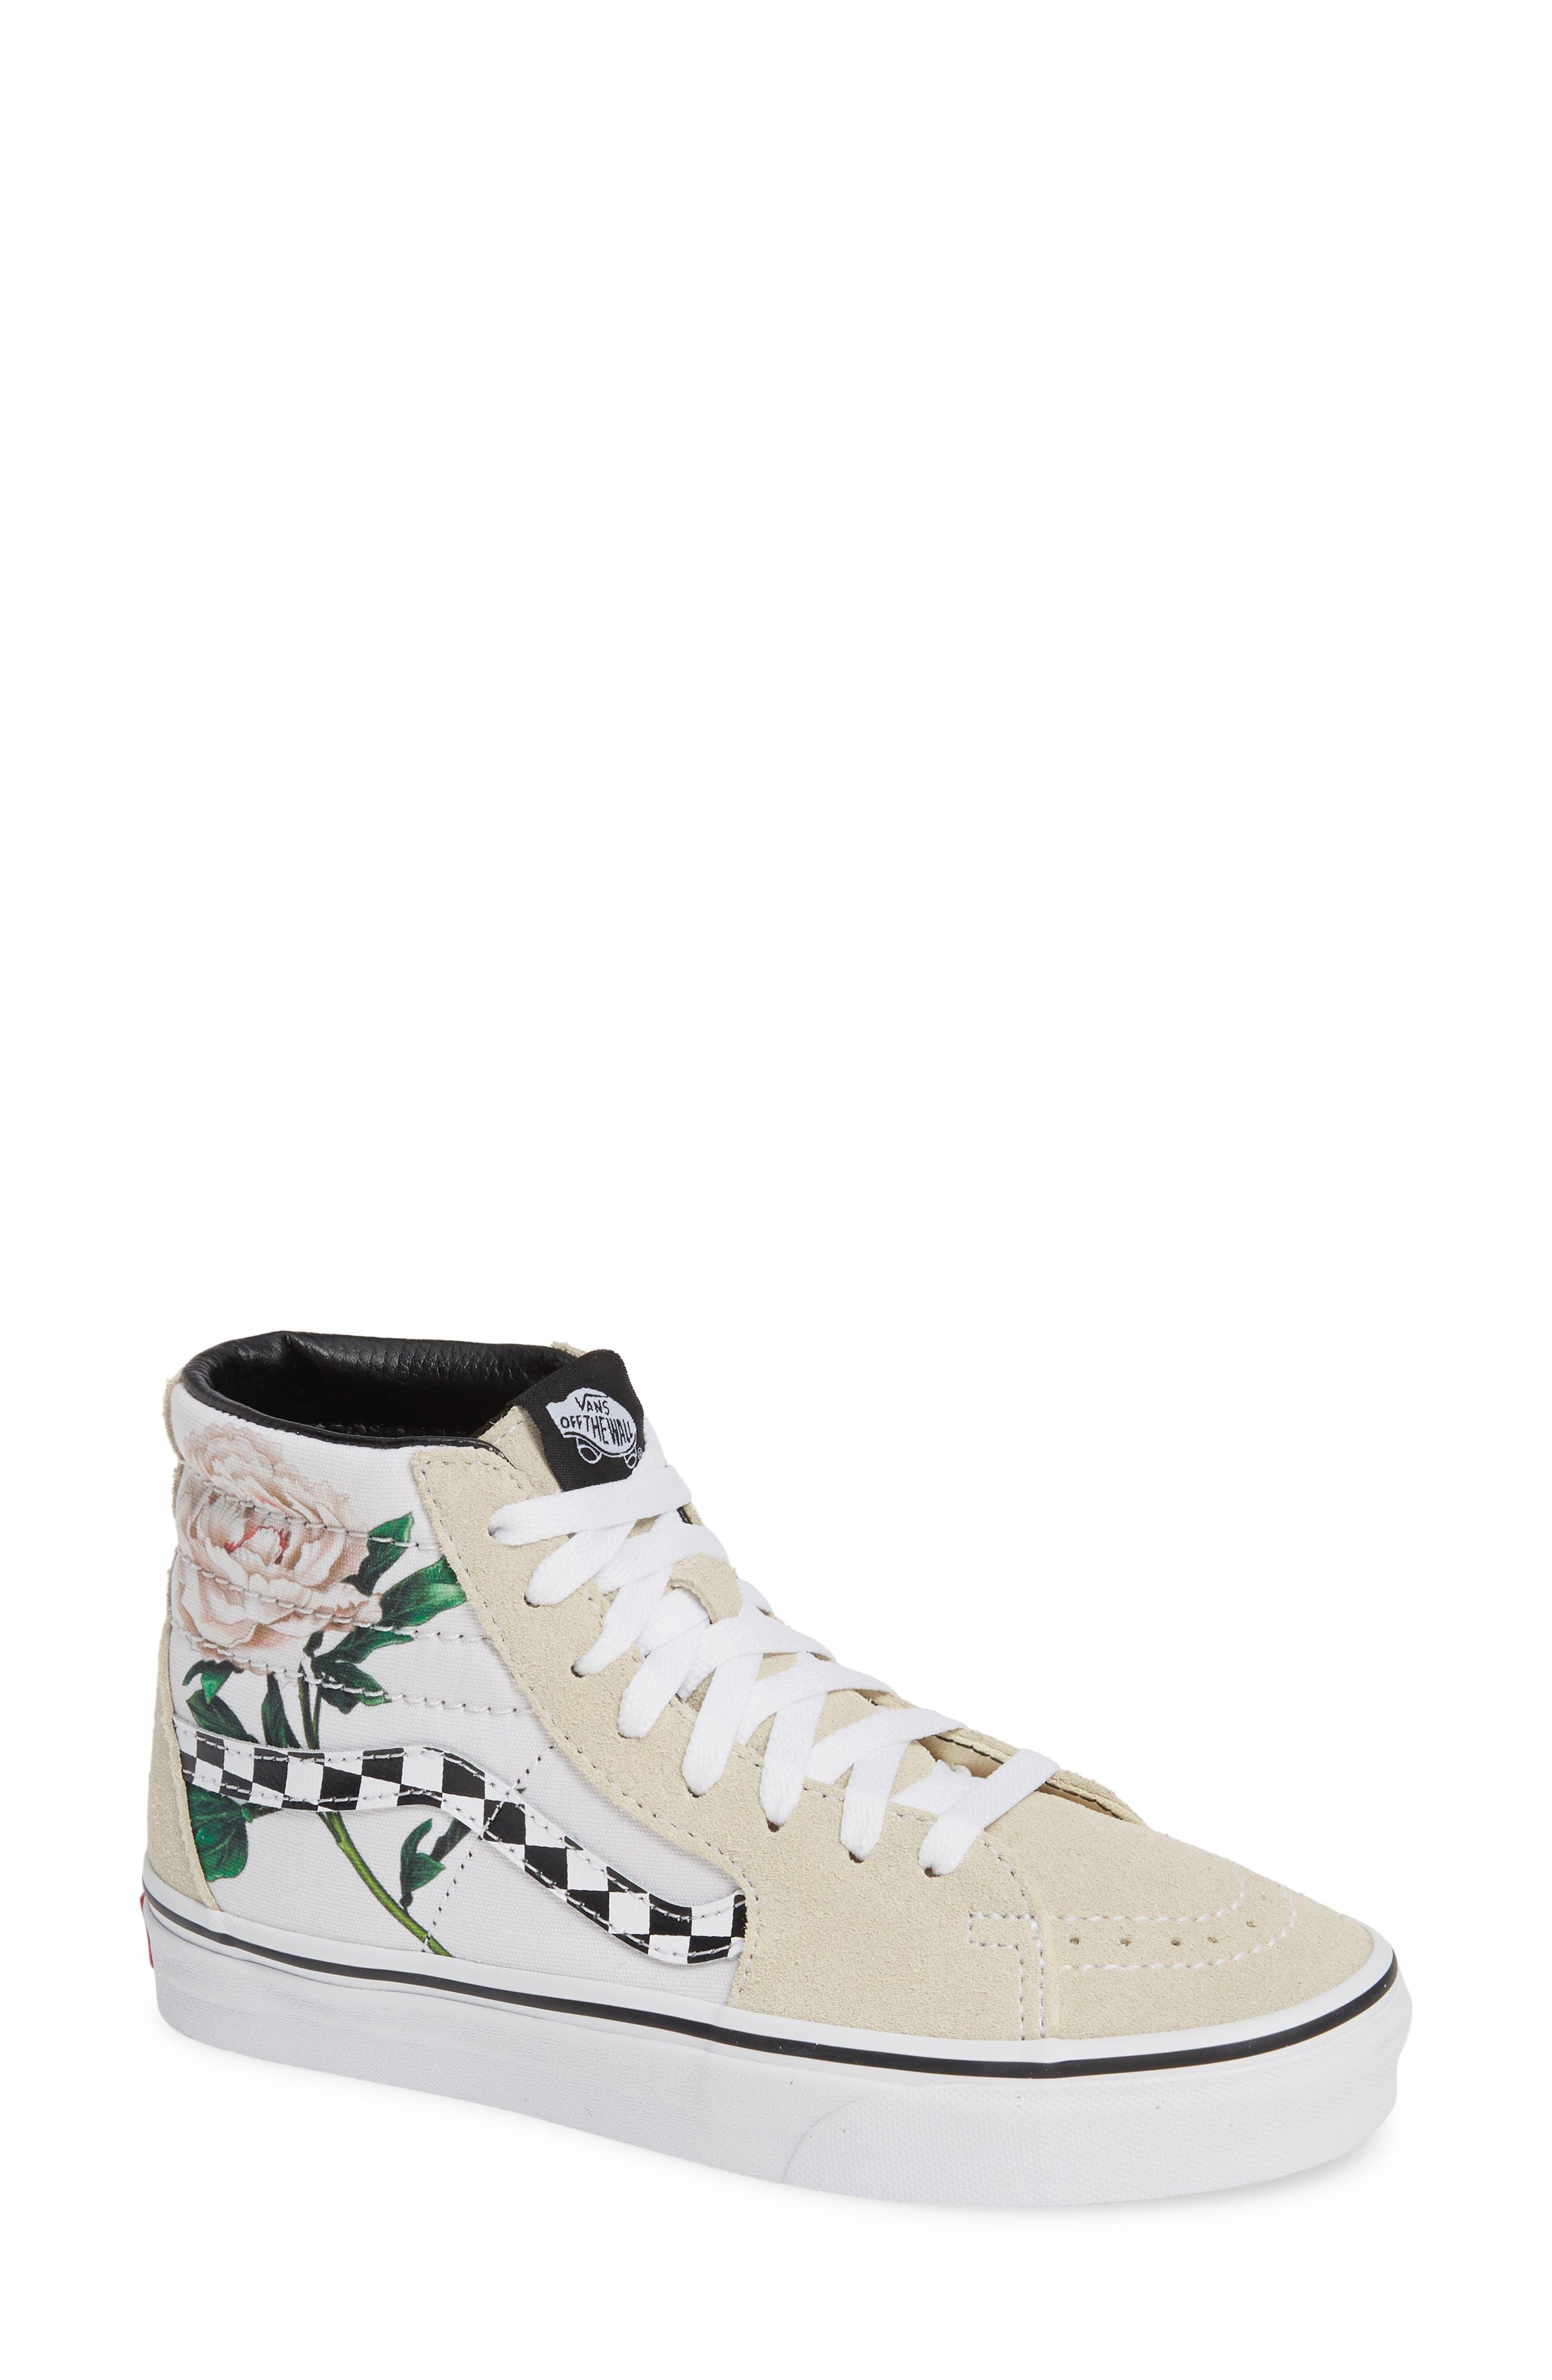 VANS,                             Sk8-Hi Checker Floral High Top Sneaker,                             Main thumbnail 1, color,                             CHECKER FLORAL TURTLEDOVE